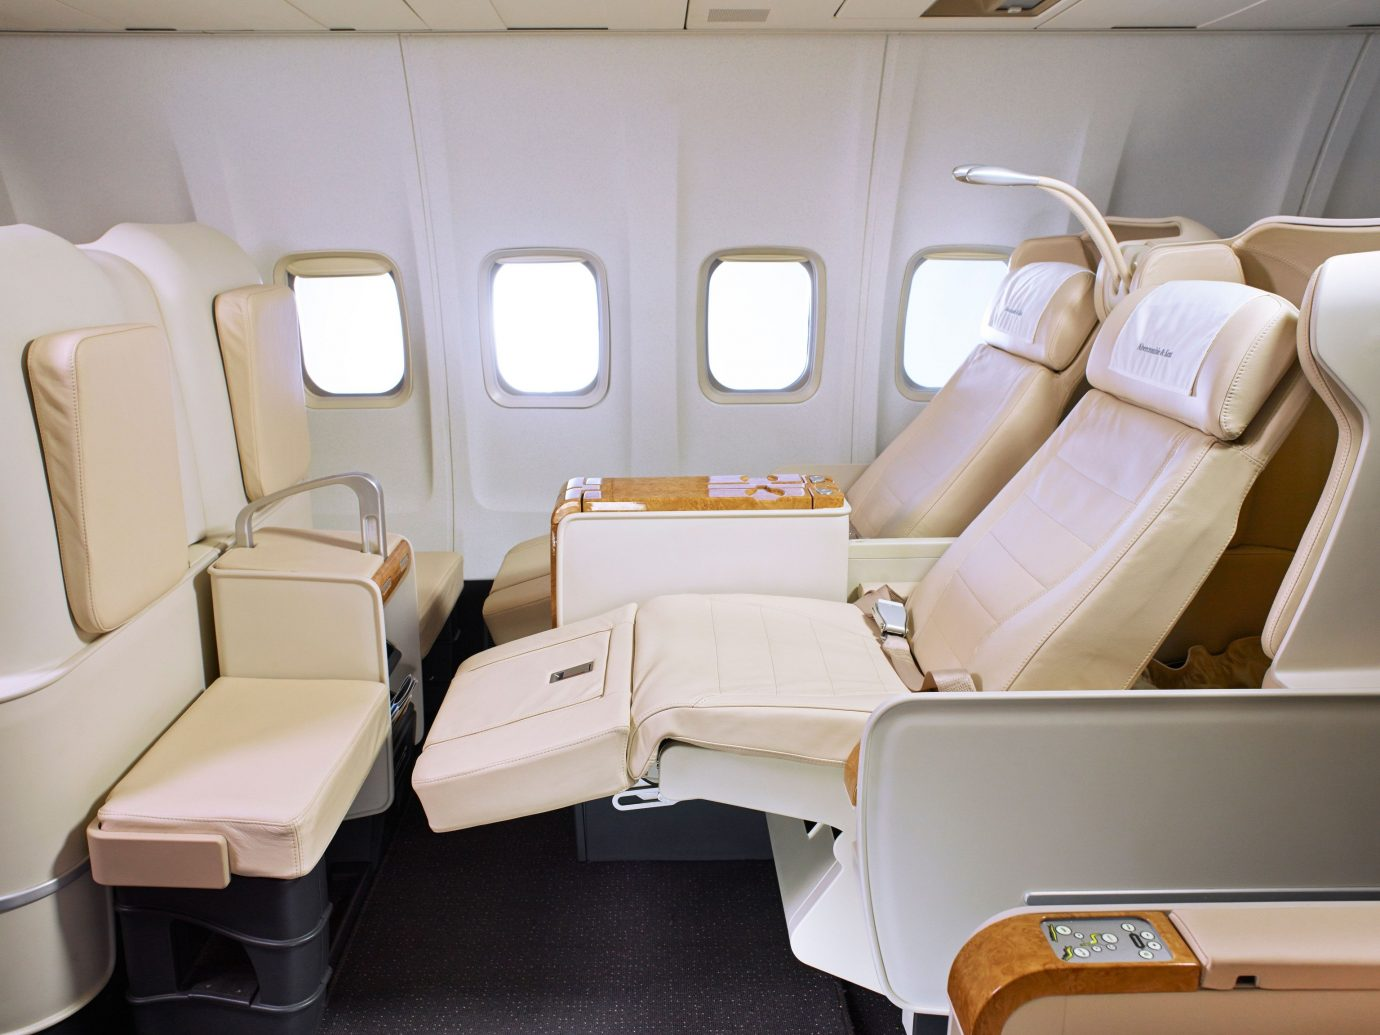 Luxury Travel Trip Ideas indoor floor airline vehicle Cabin aircraft cabin passenger furniture